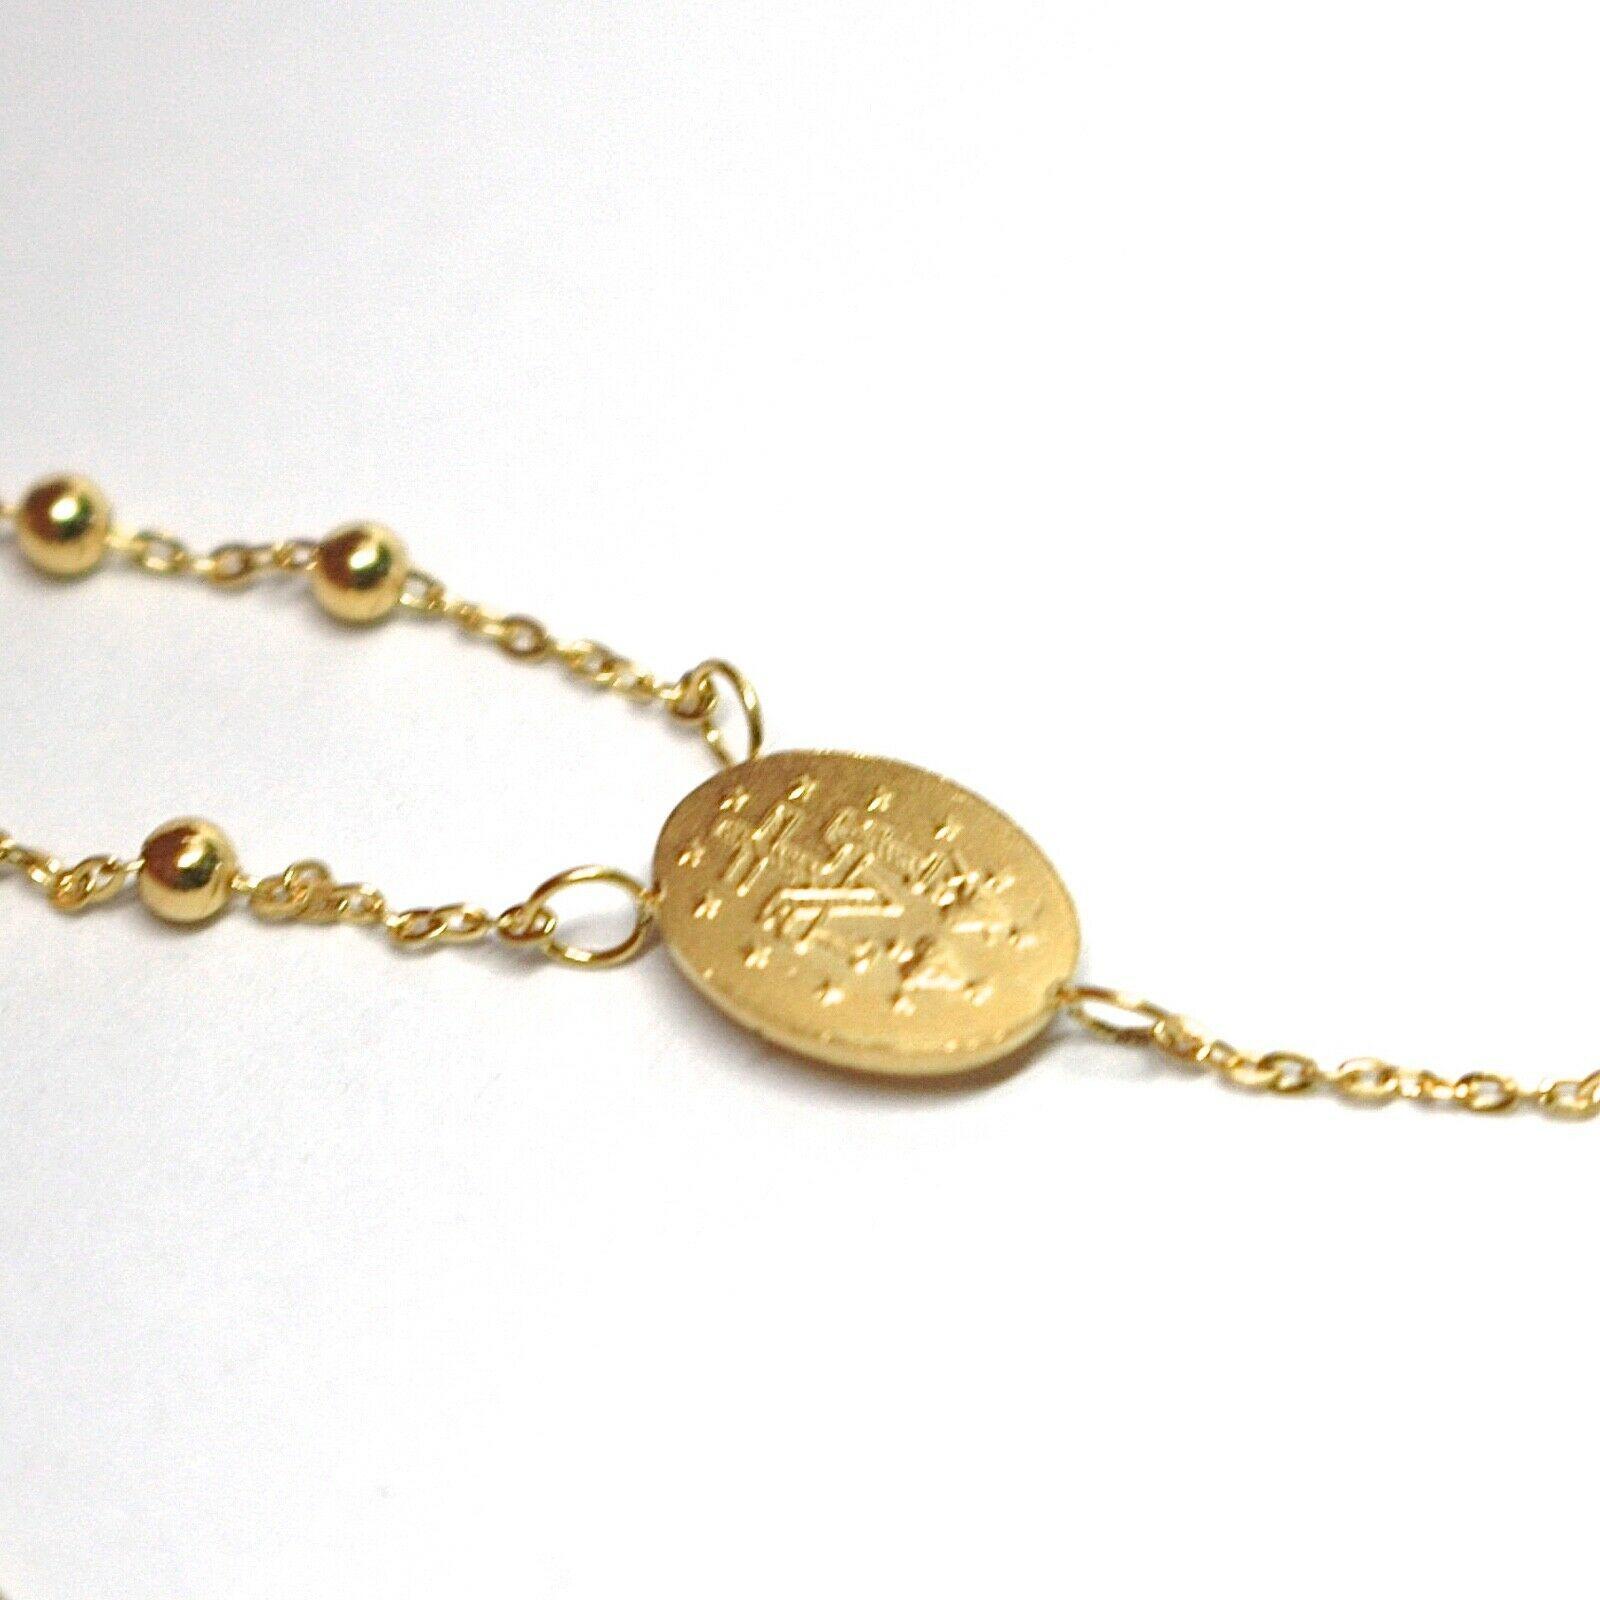 Mini Collar Rosario Oro Amarillo 750 18K, Medalla Milagrosa, Cruz, 48 CM image 4